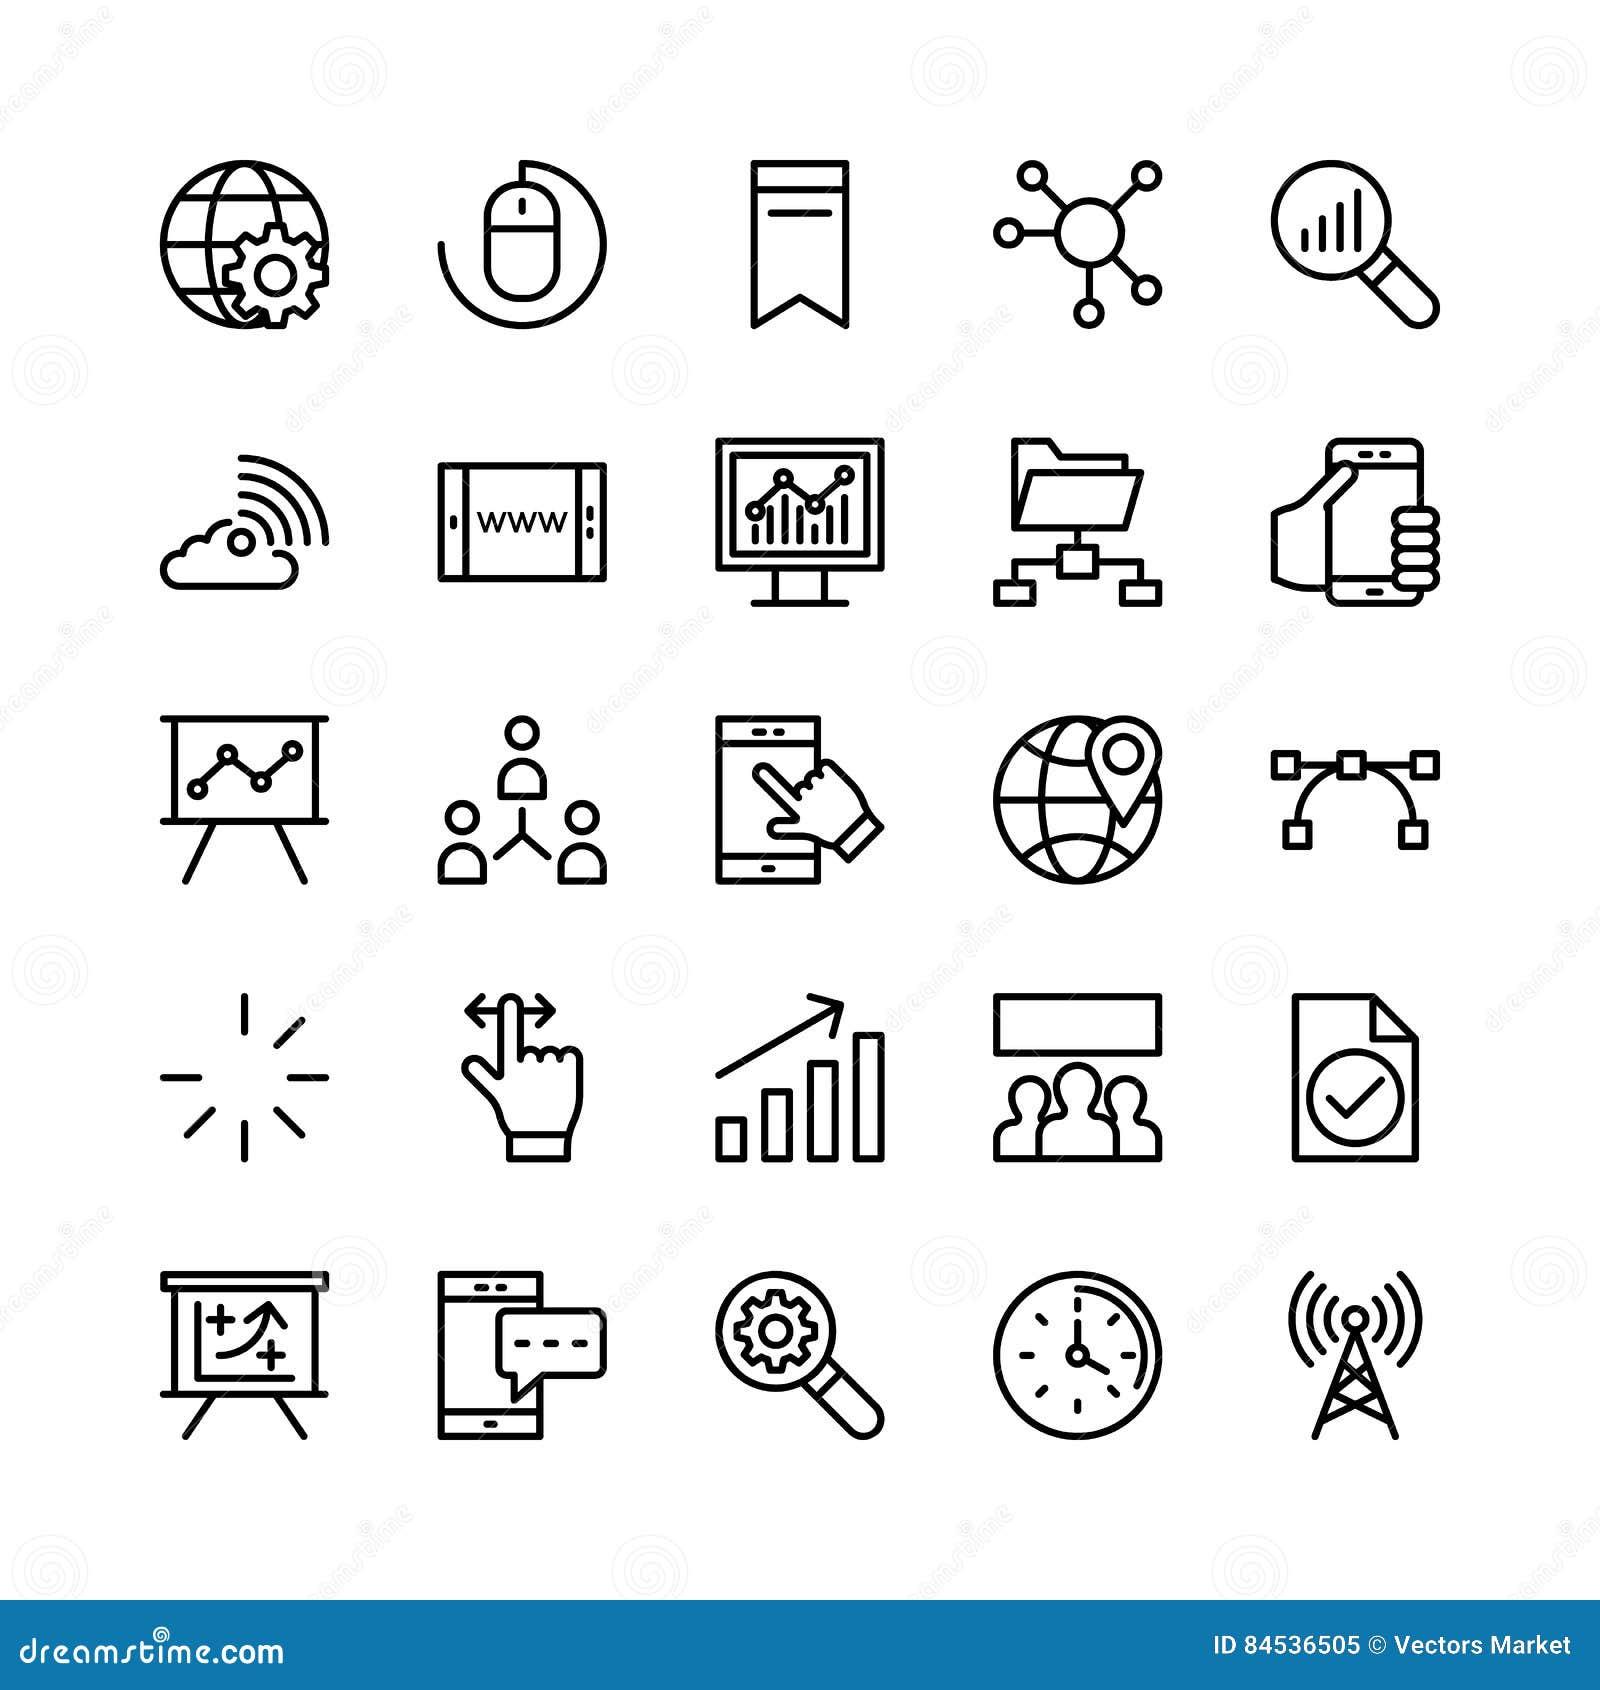 Digital marketing line vector icons 1 royalty free stock for Digital marketing materials